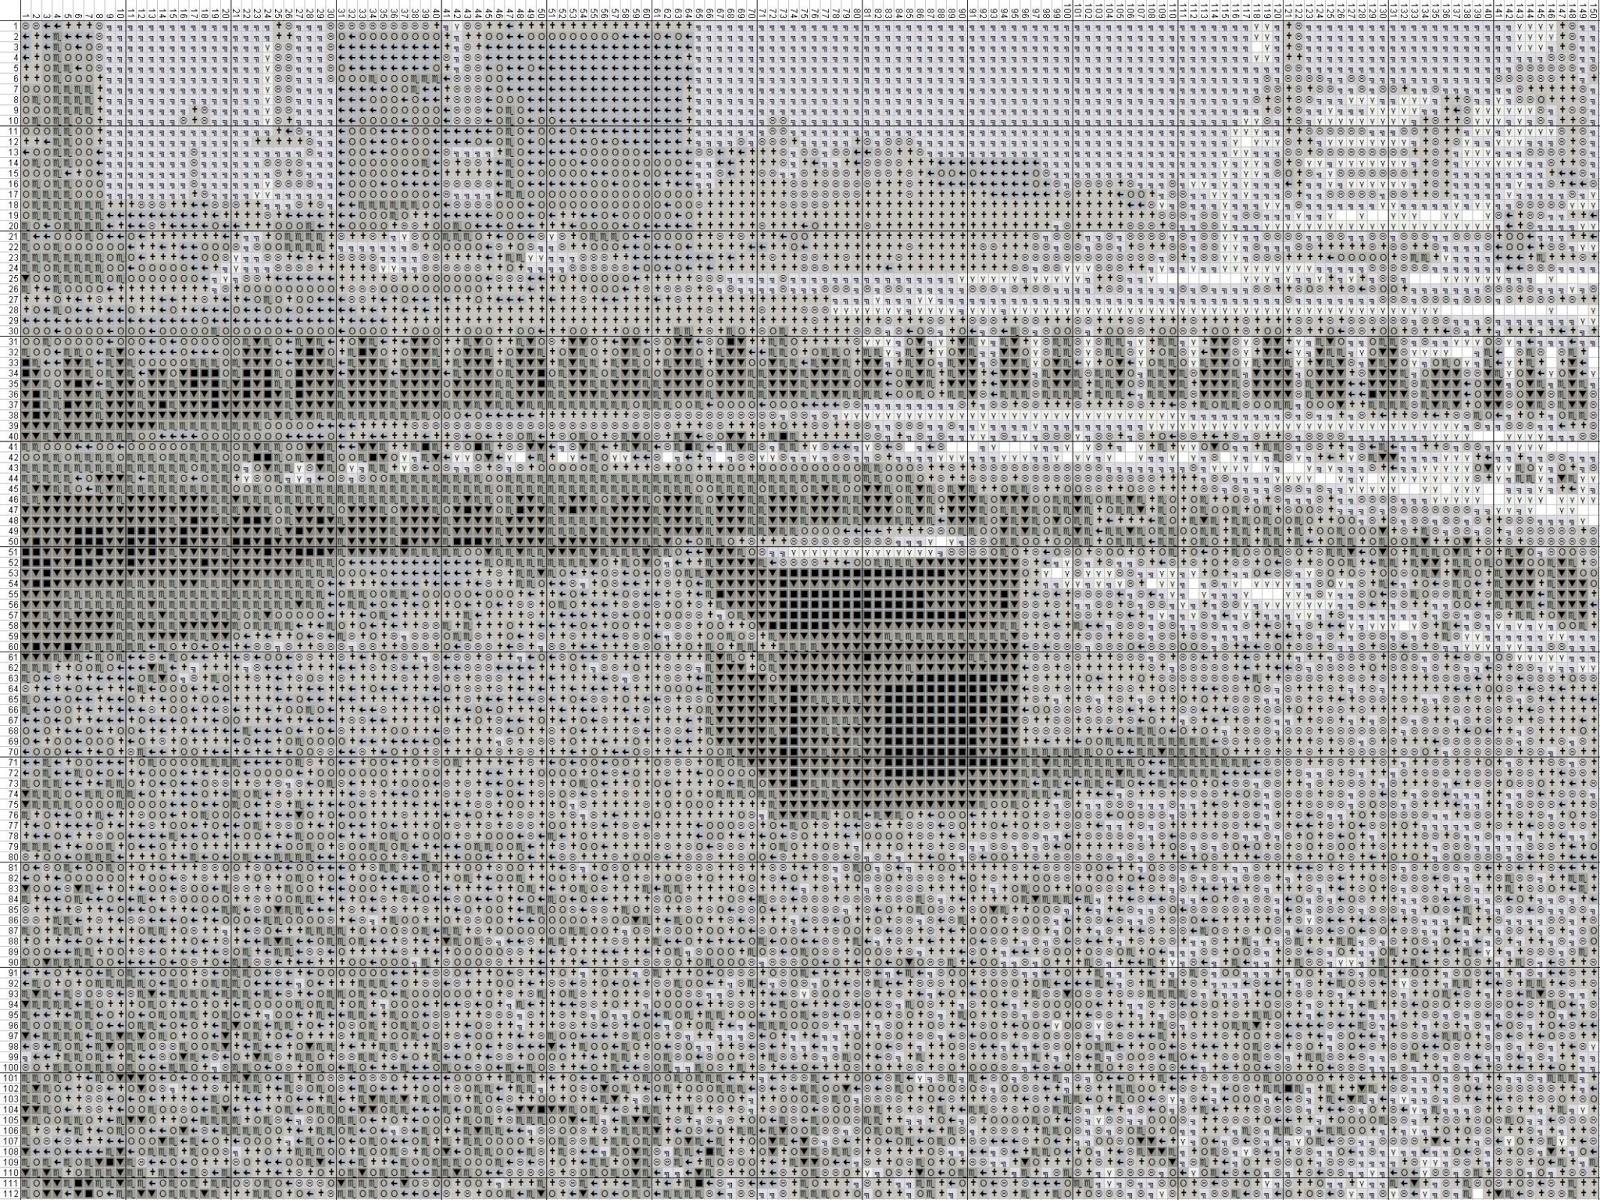 Gambar Kristik Ka'bah - Mekah - Arab Saudi